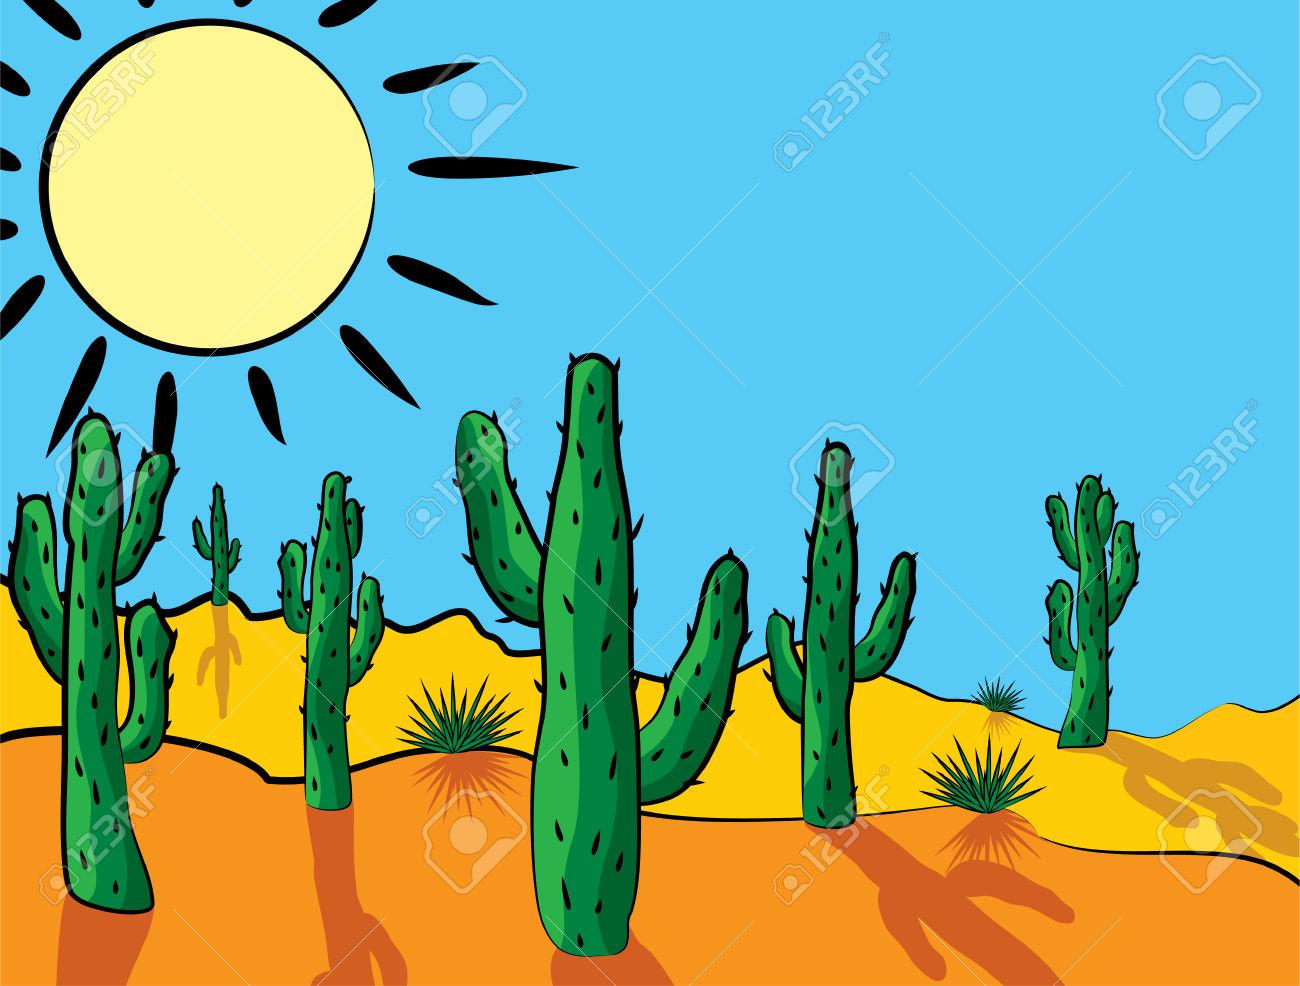 Desert clipart #9, Download drawings